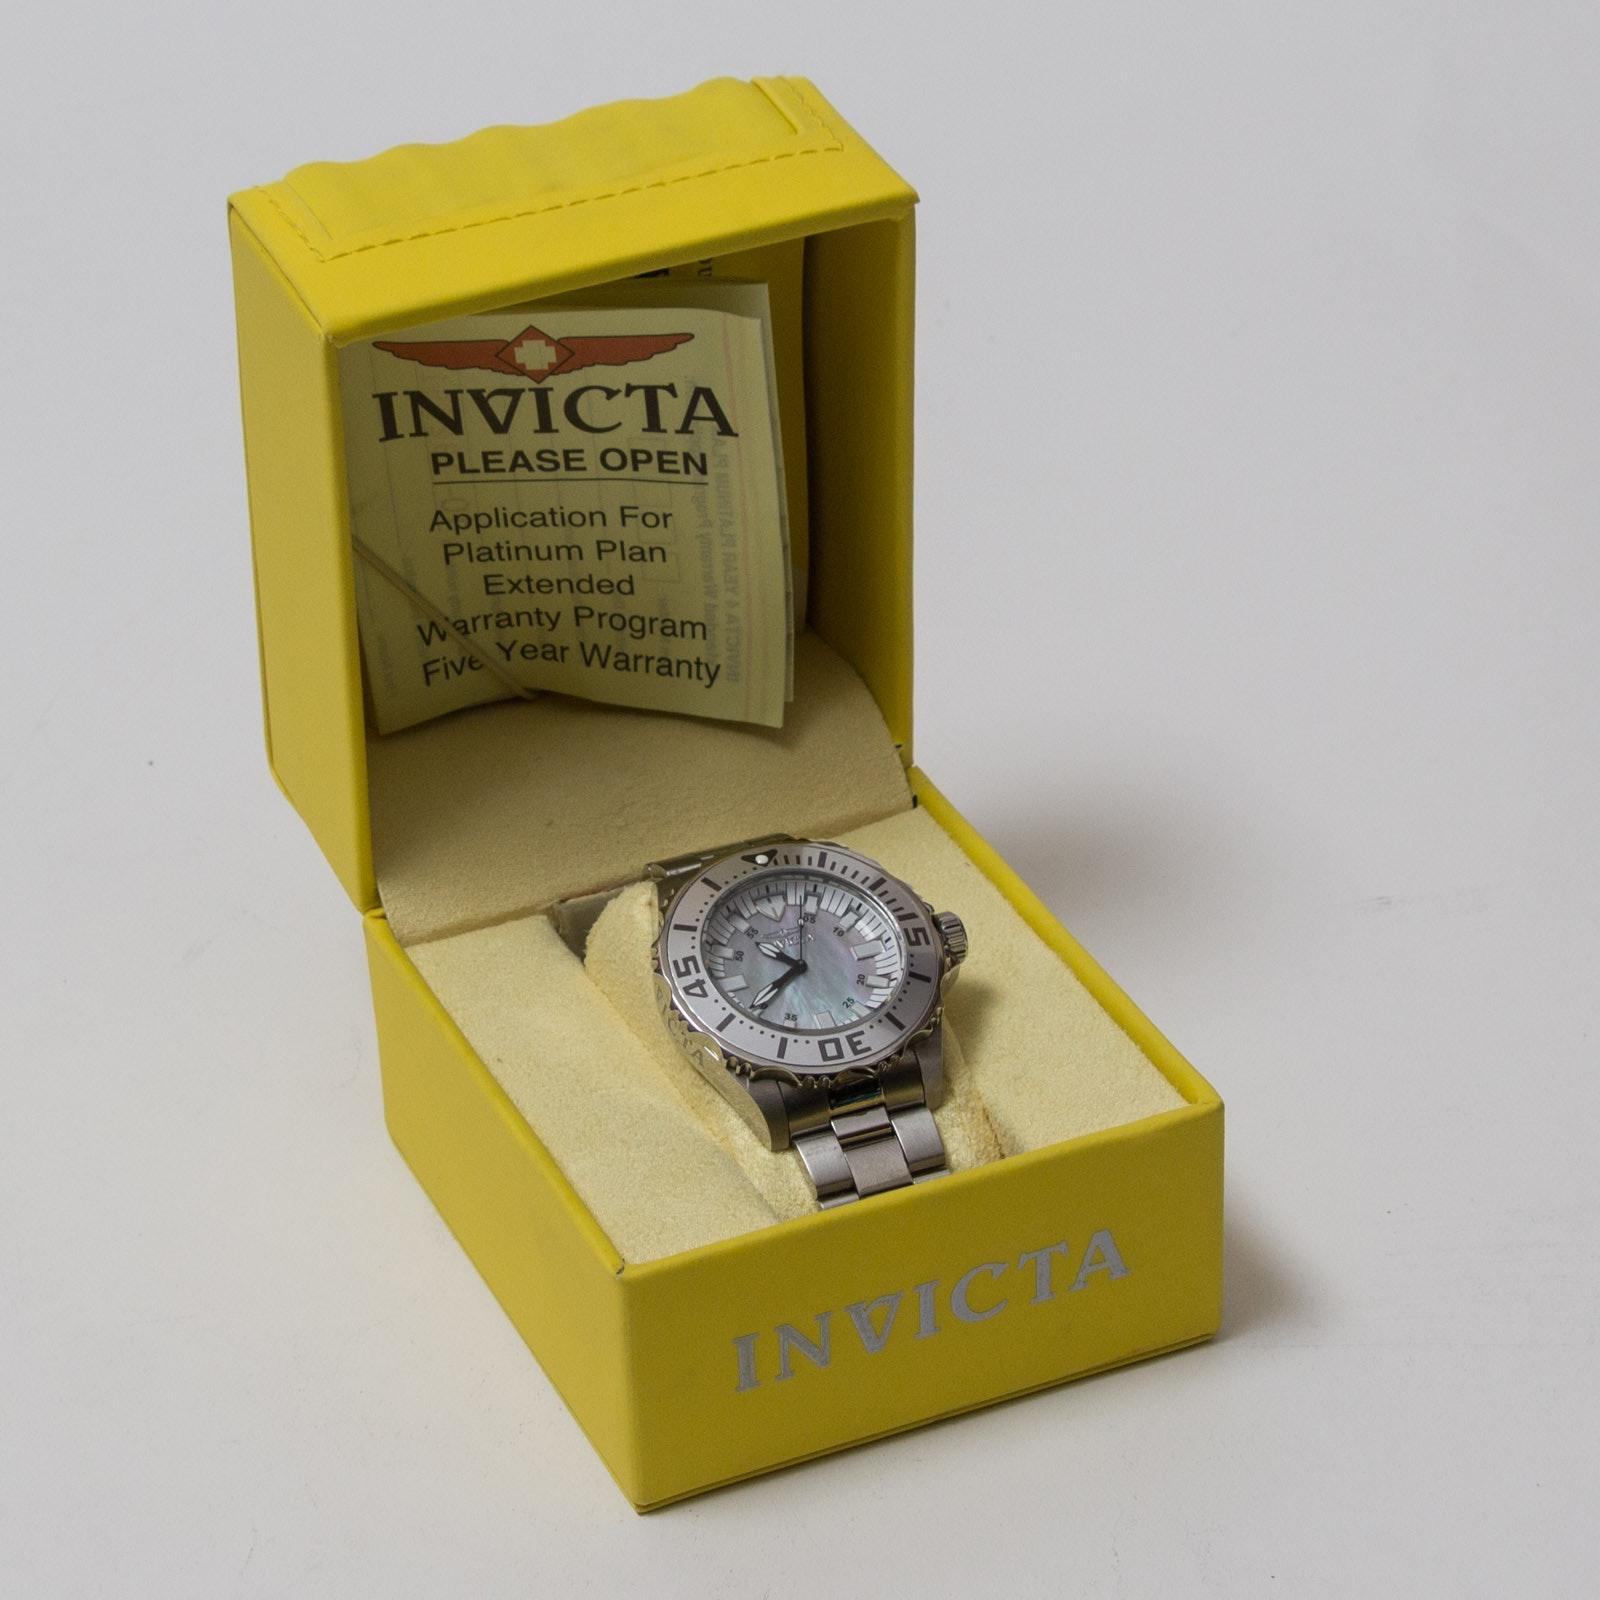 Invicta Pro Diver # 17693 Wristwatch